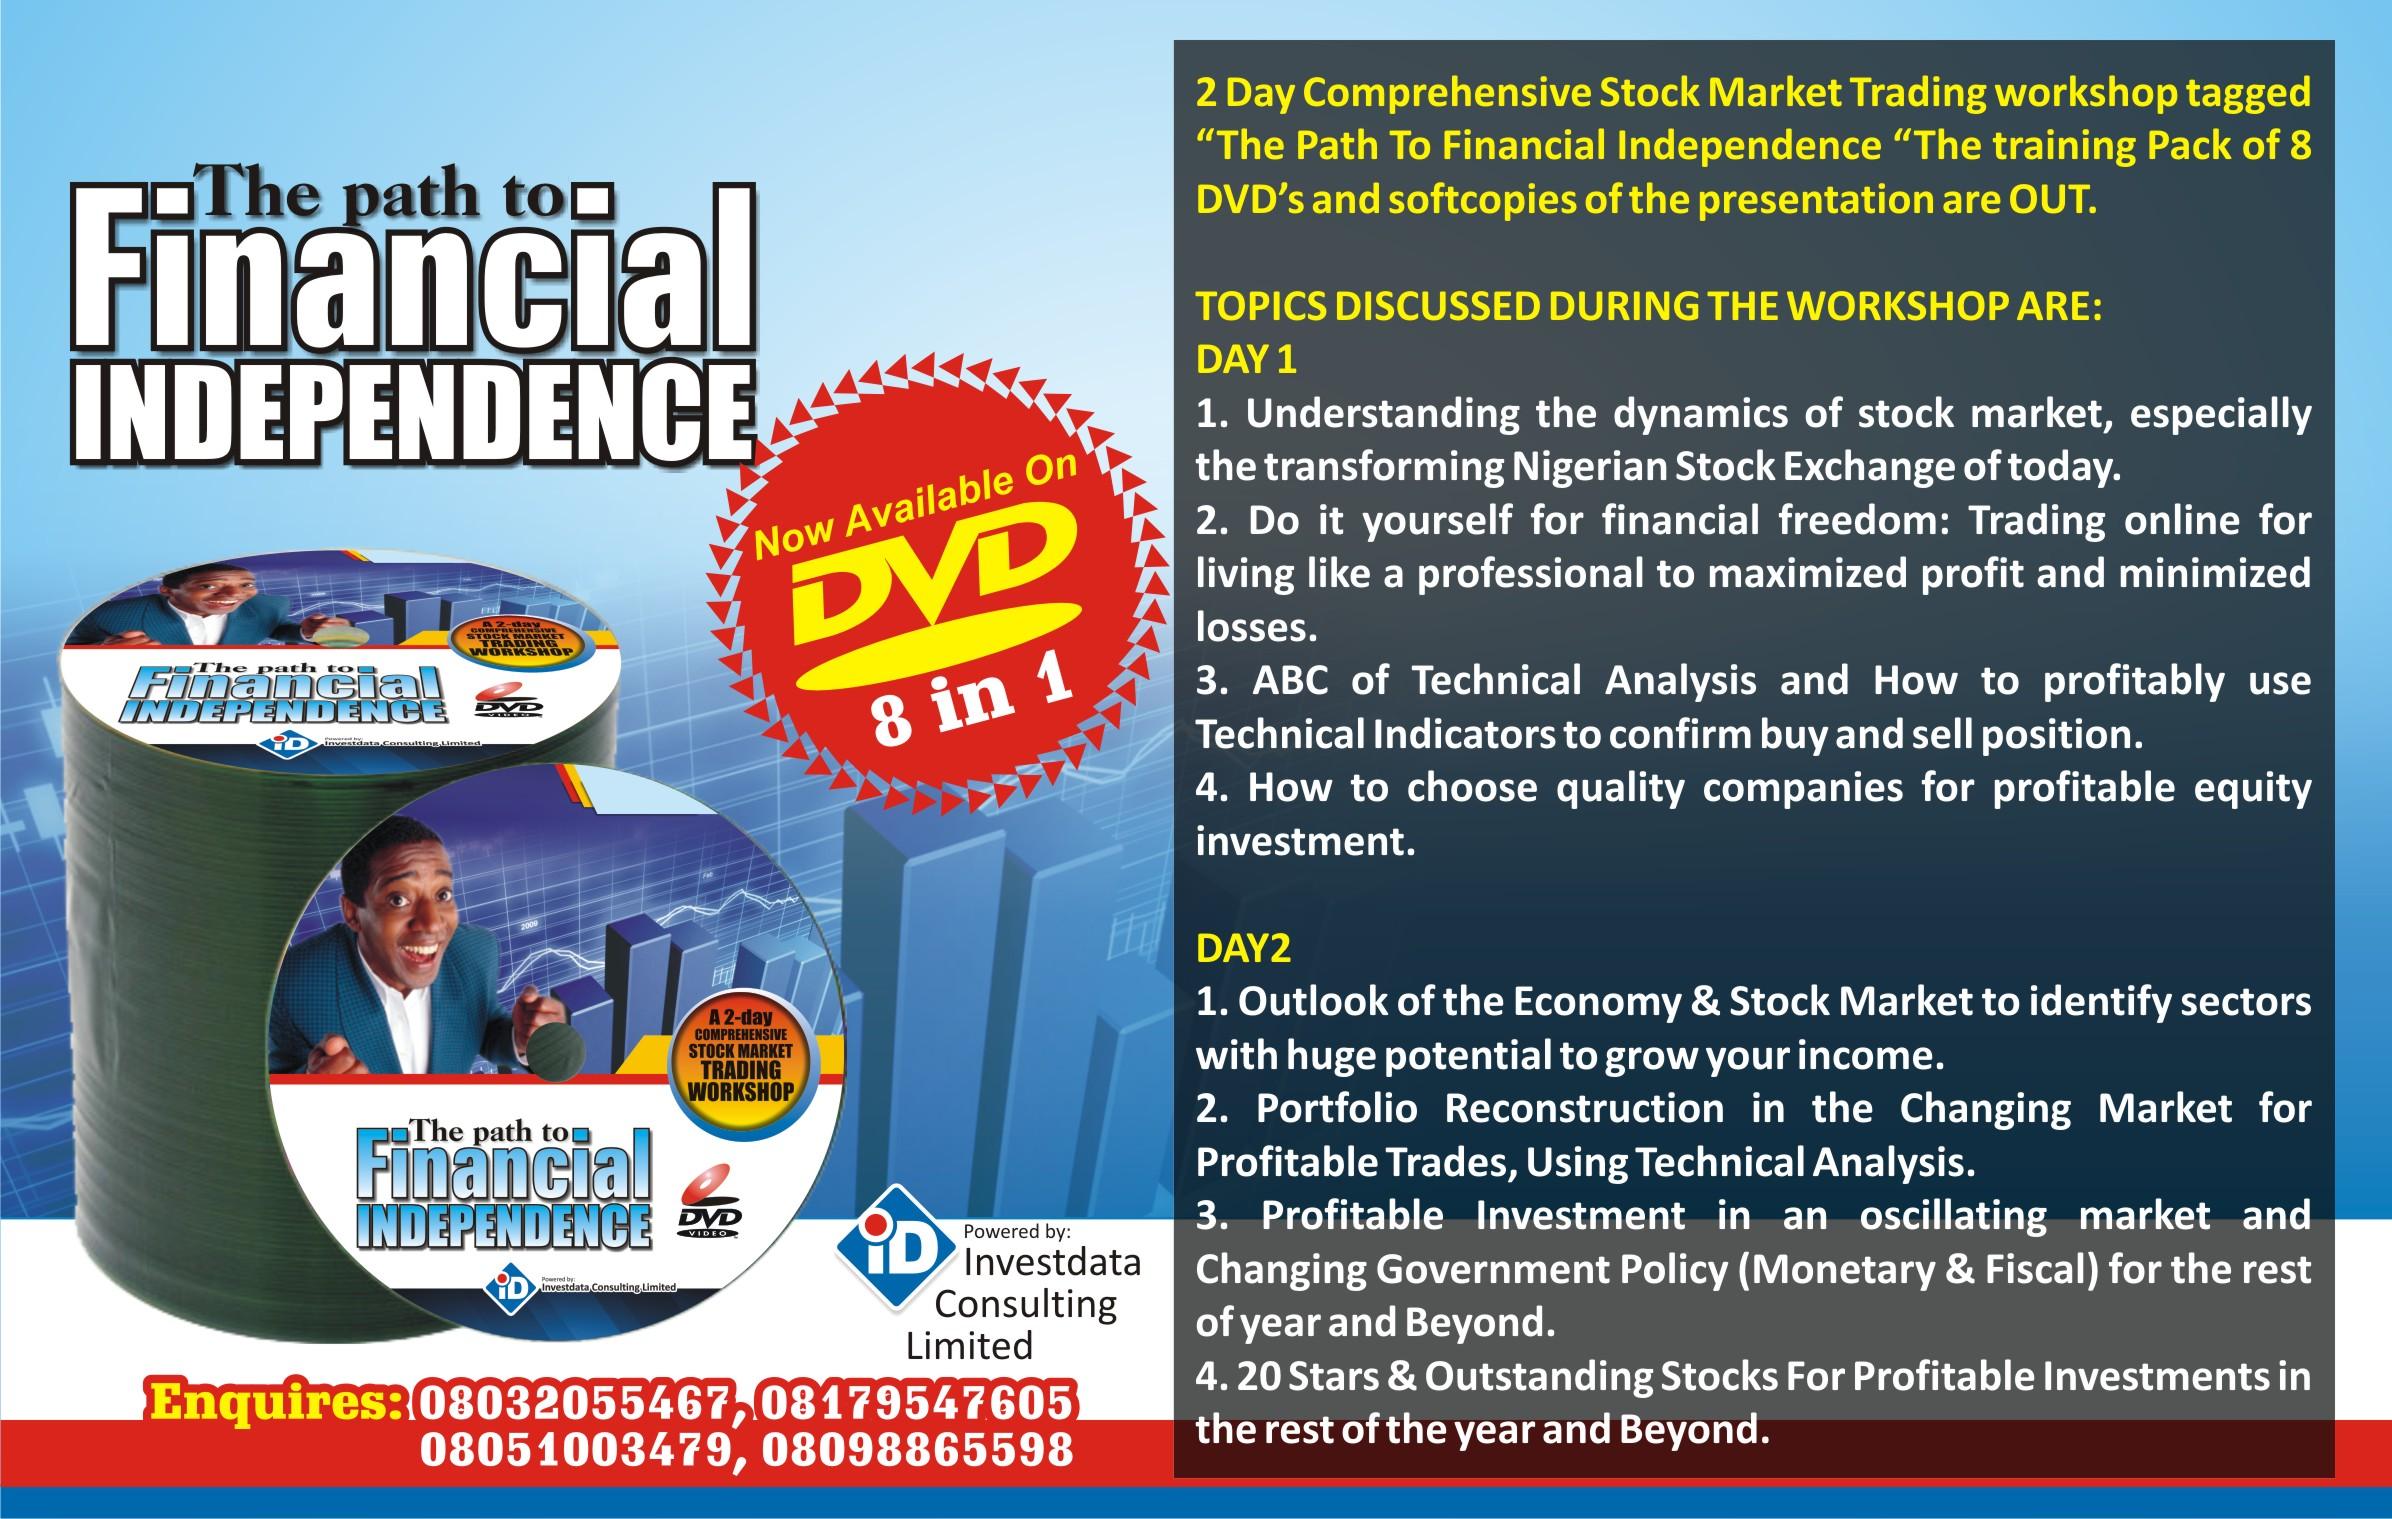 investdata-cd-advert-1